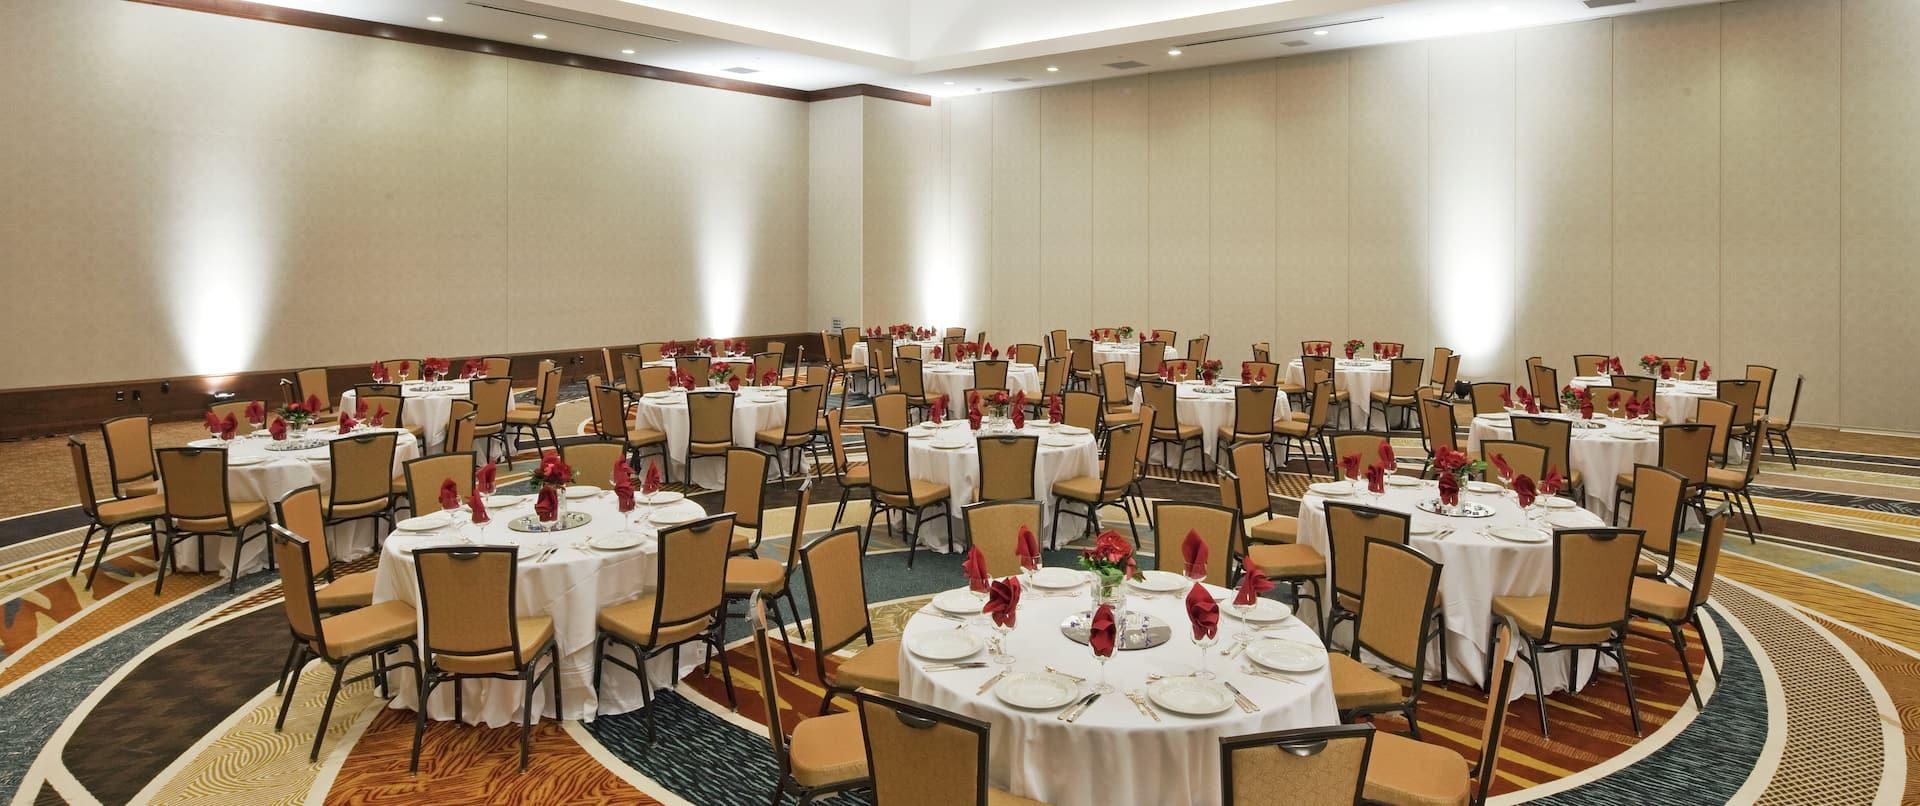 Grand Central Ballroom Round Tables